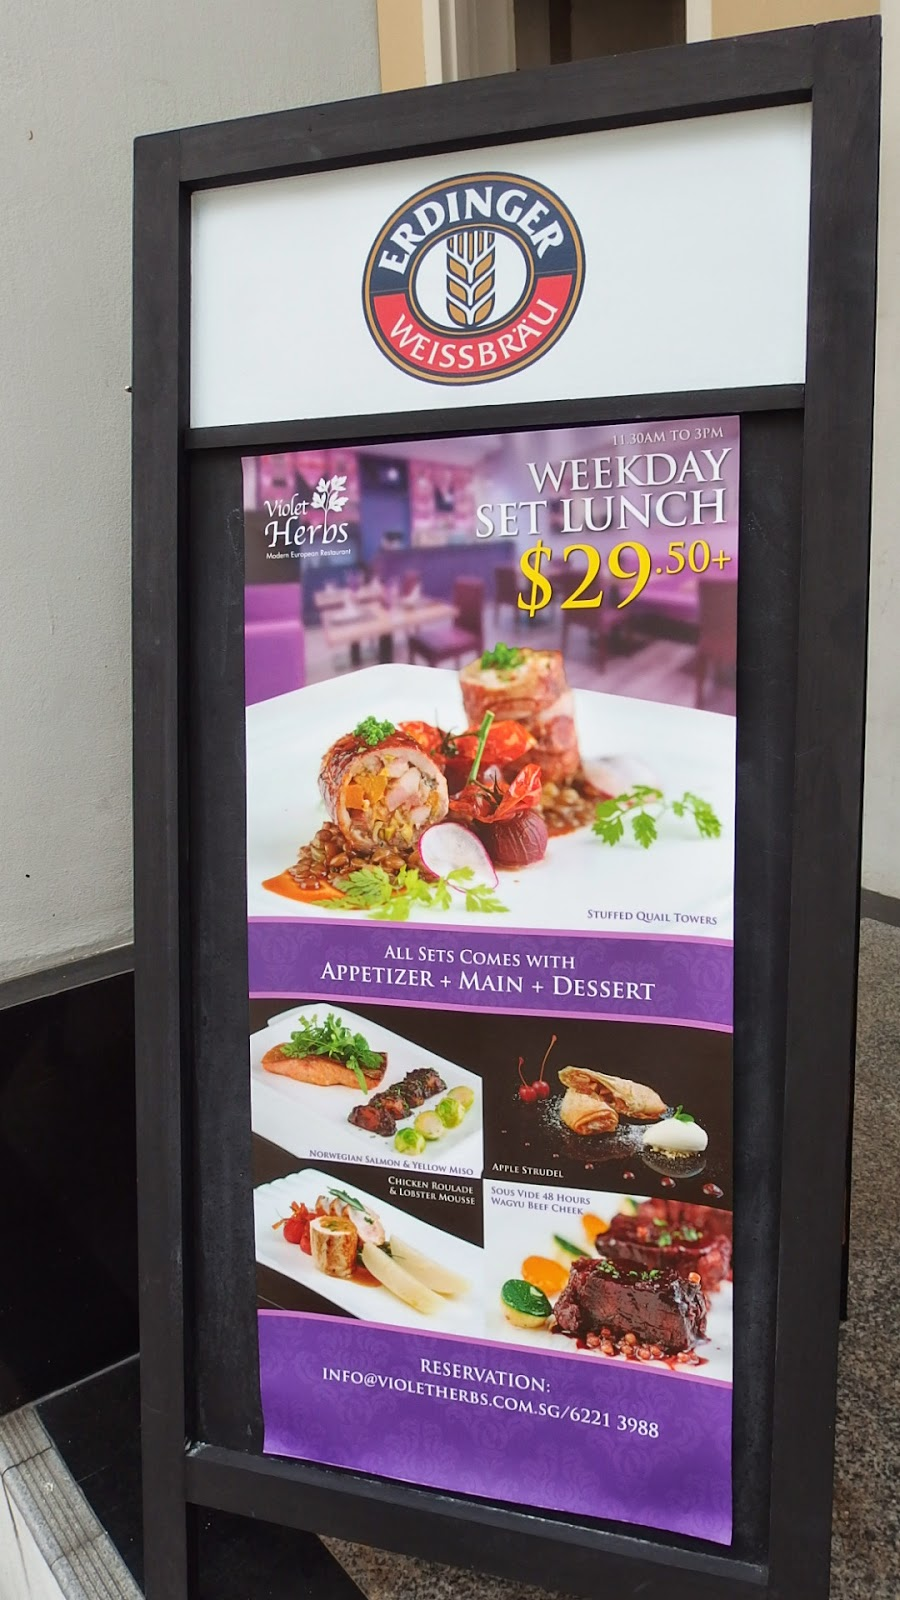 SuMMeR LoVes To Eat! Singapore Food Blog: Restaurant Week